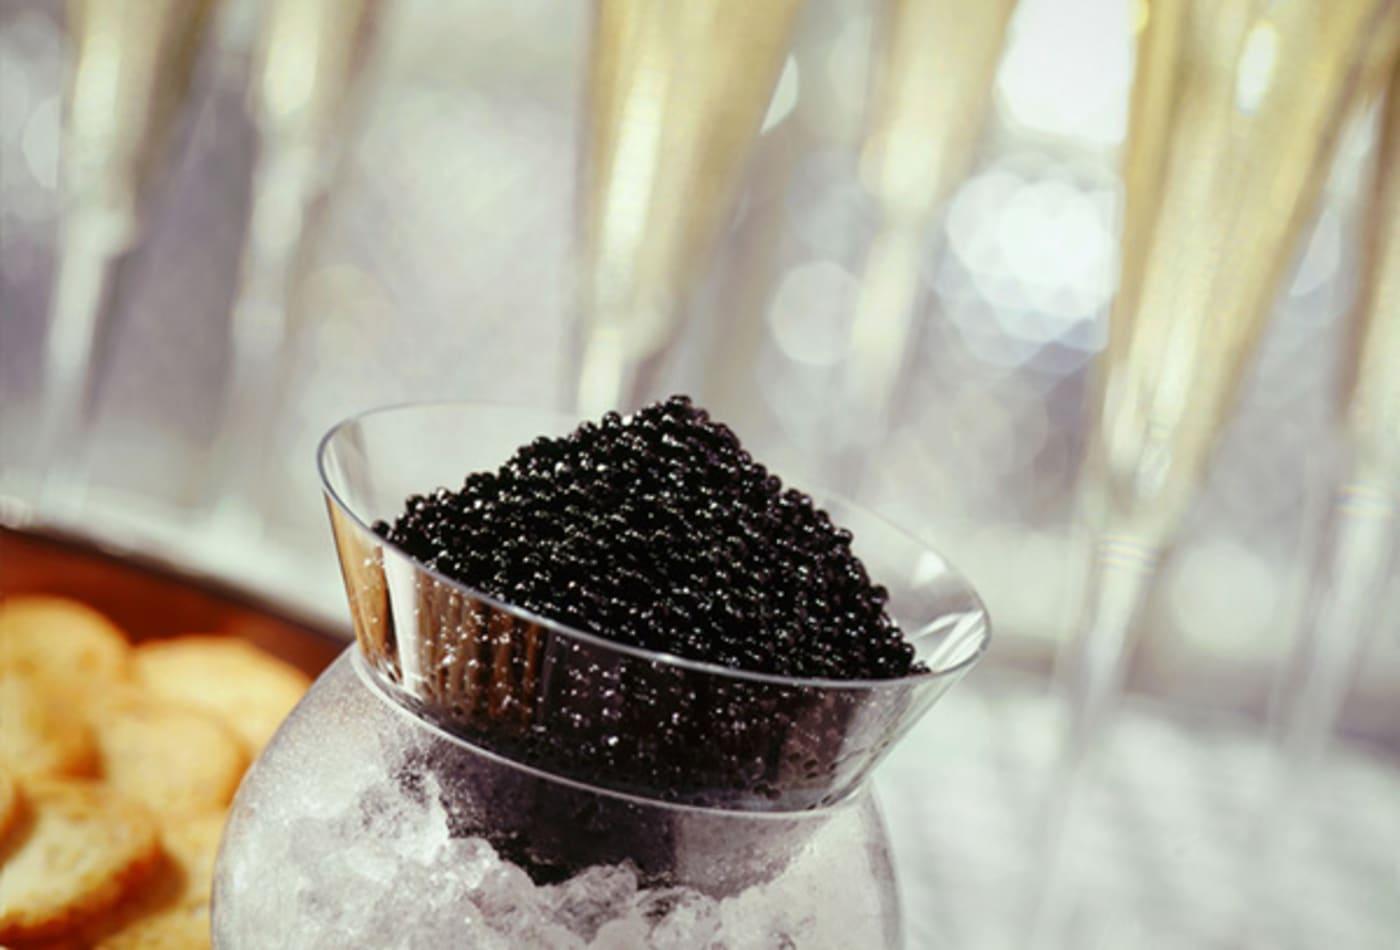 James-Bond-Collectibles-caviar.jpg